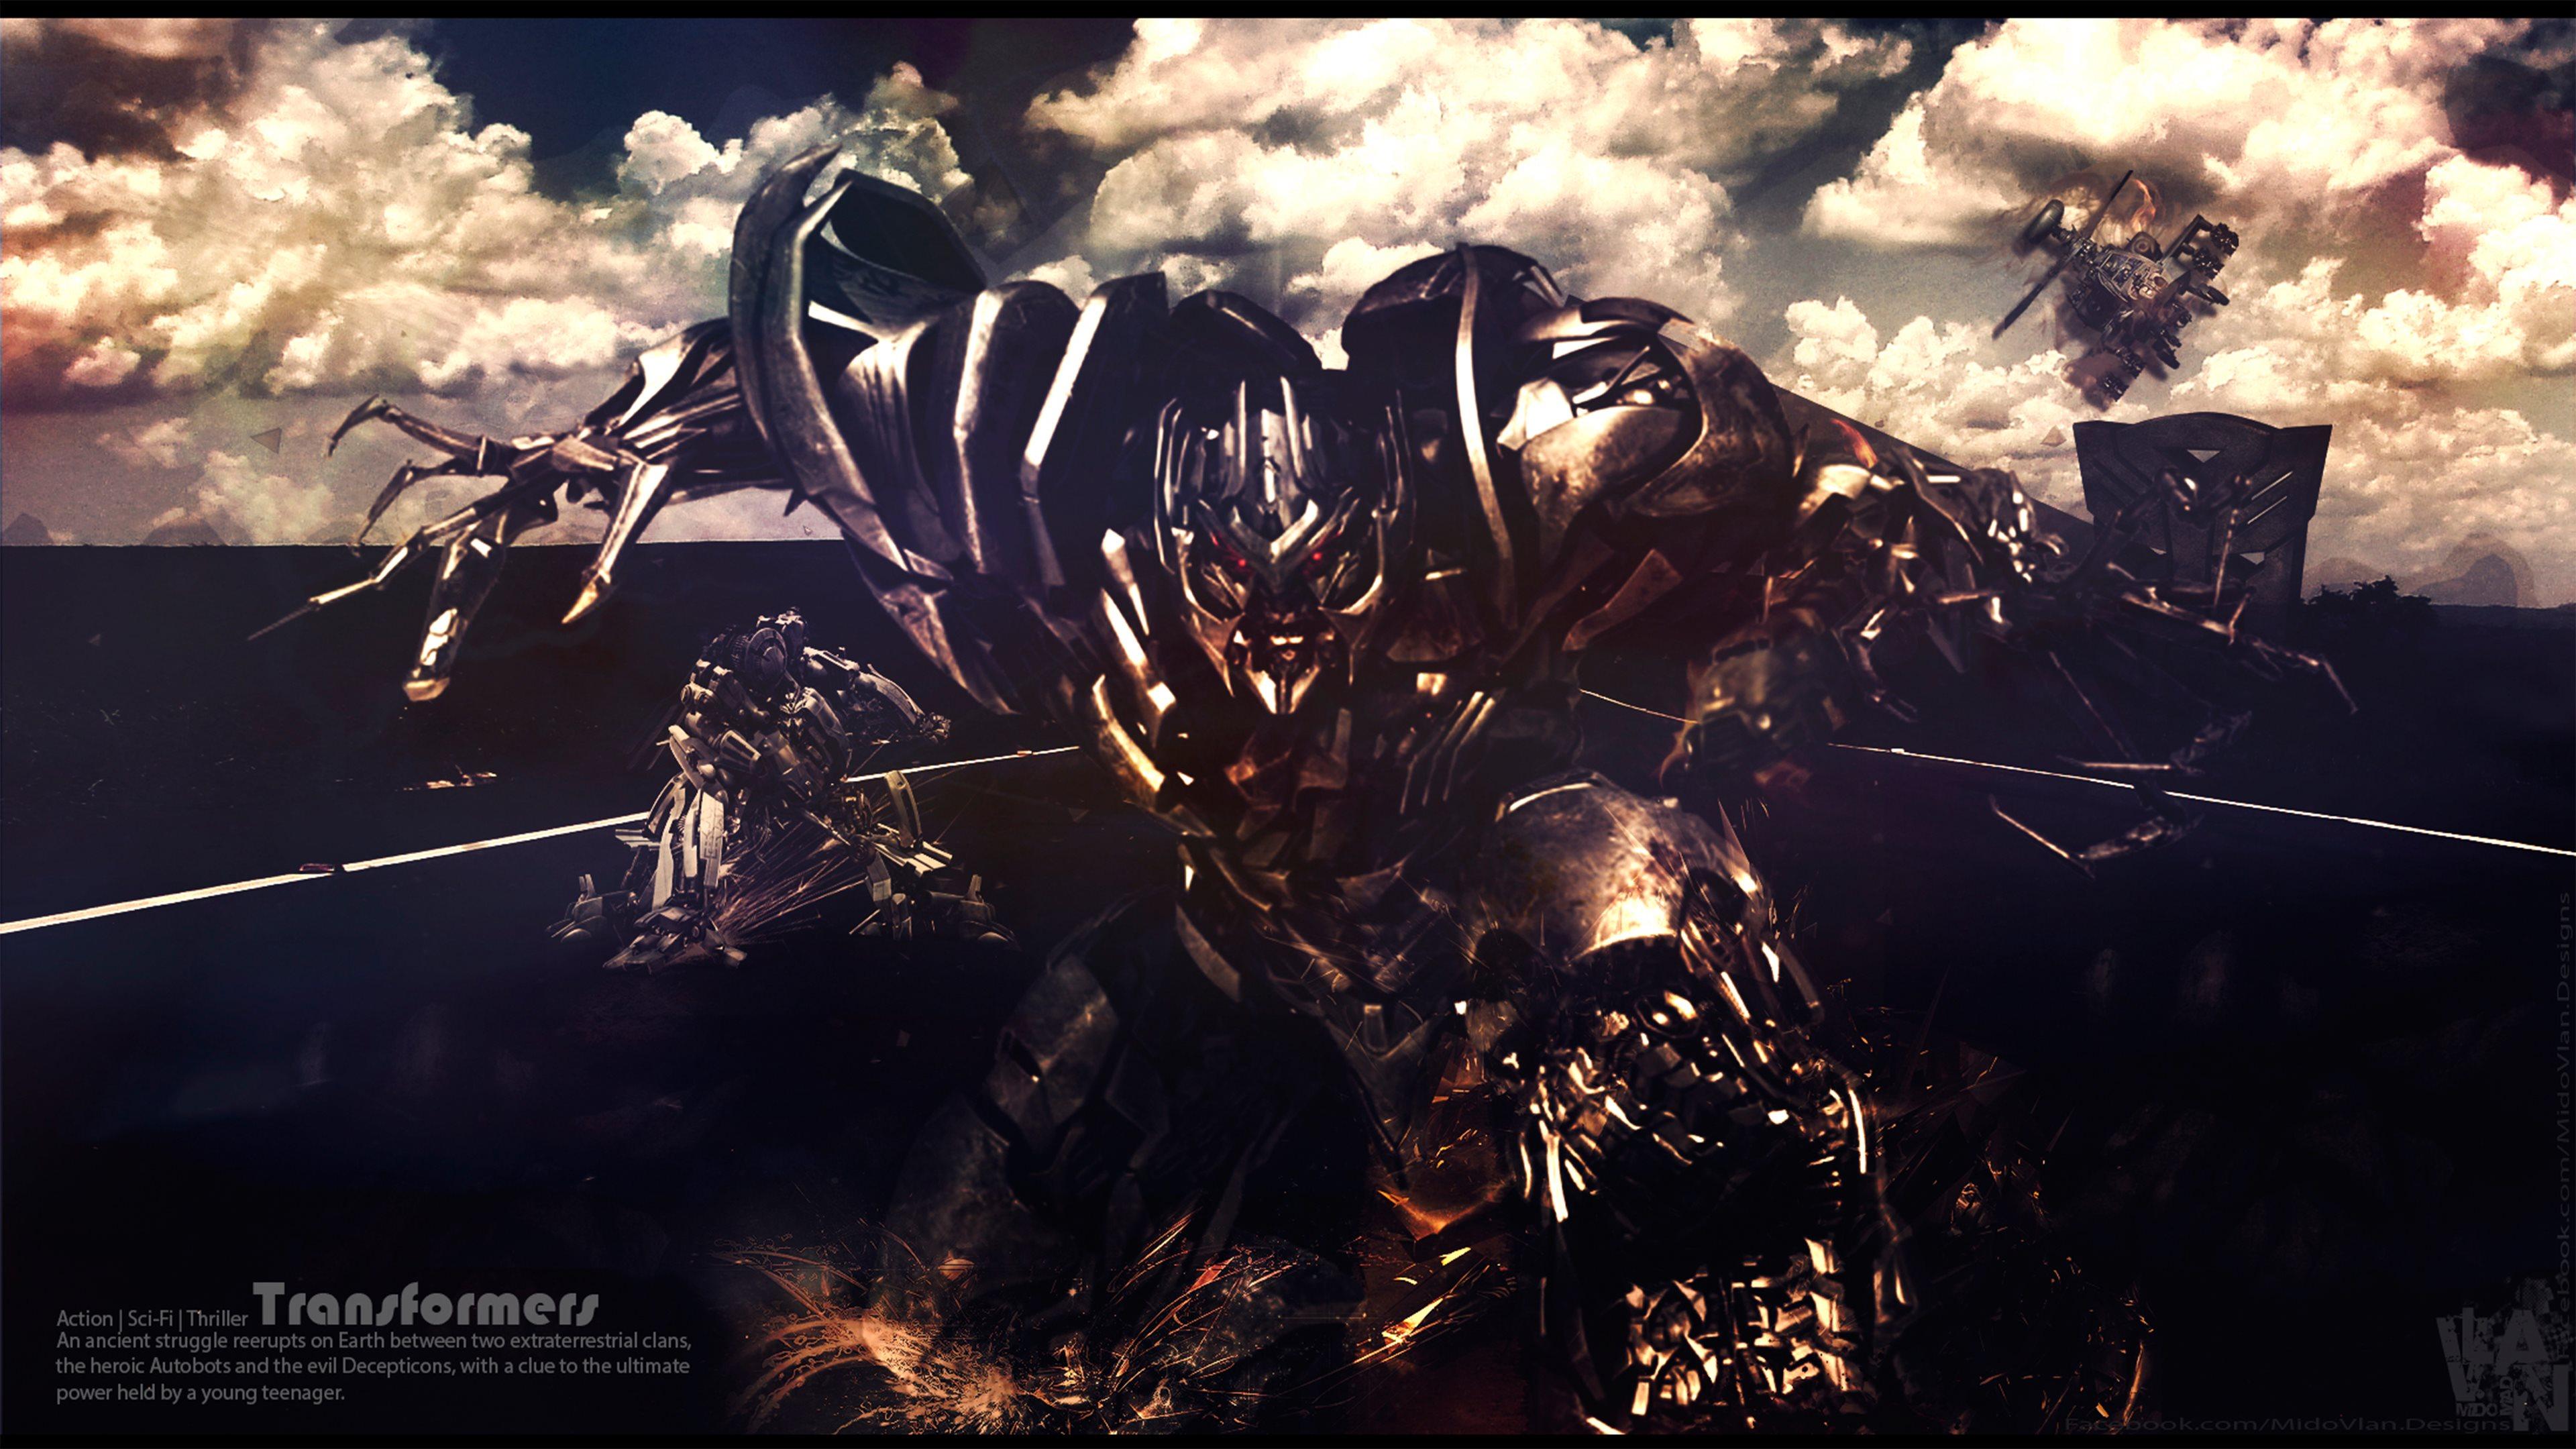 Wallpaper Fan Art 4k Pubattlegrounds: Transformers 4K Wallpaper